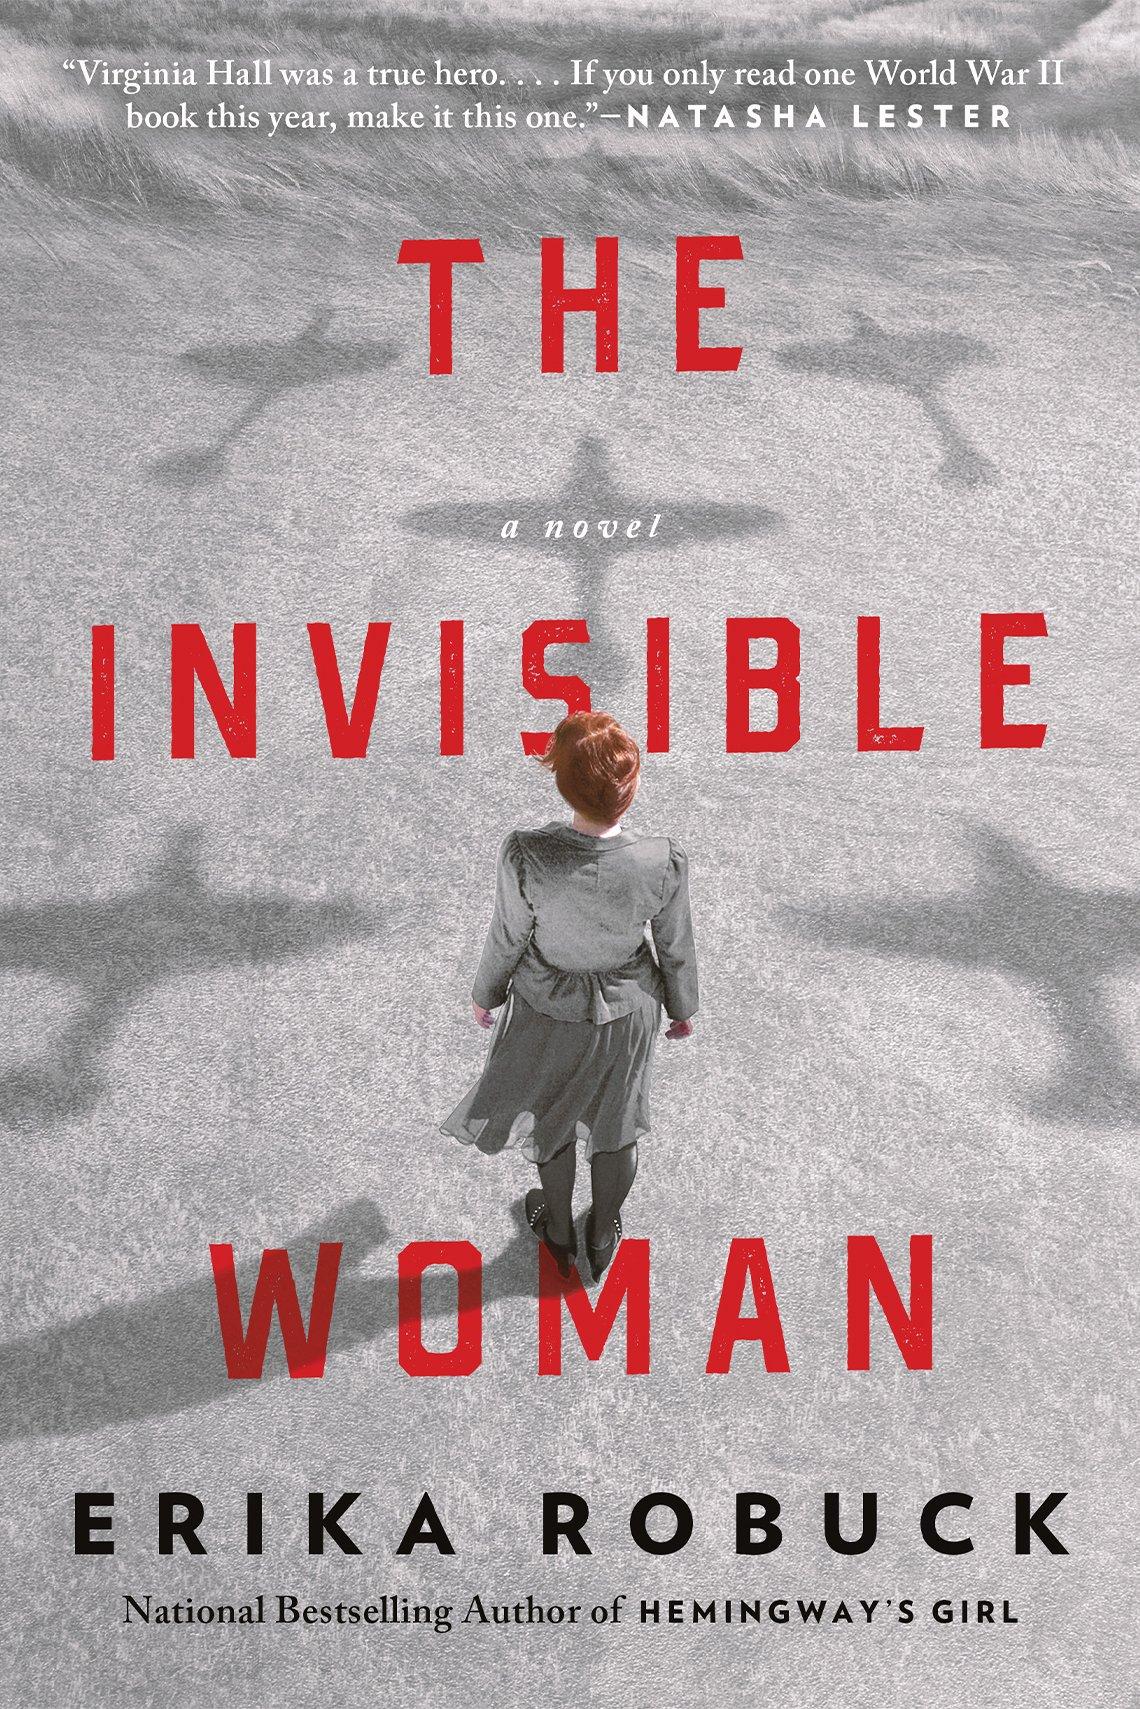 Portada del libro The Invisible Woman de Erika Robuck.